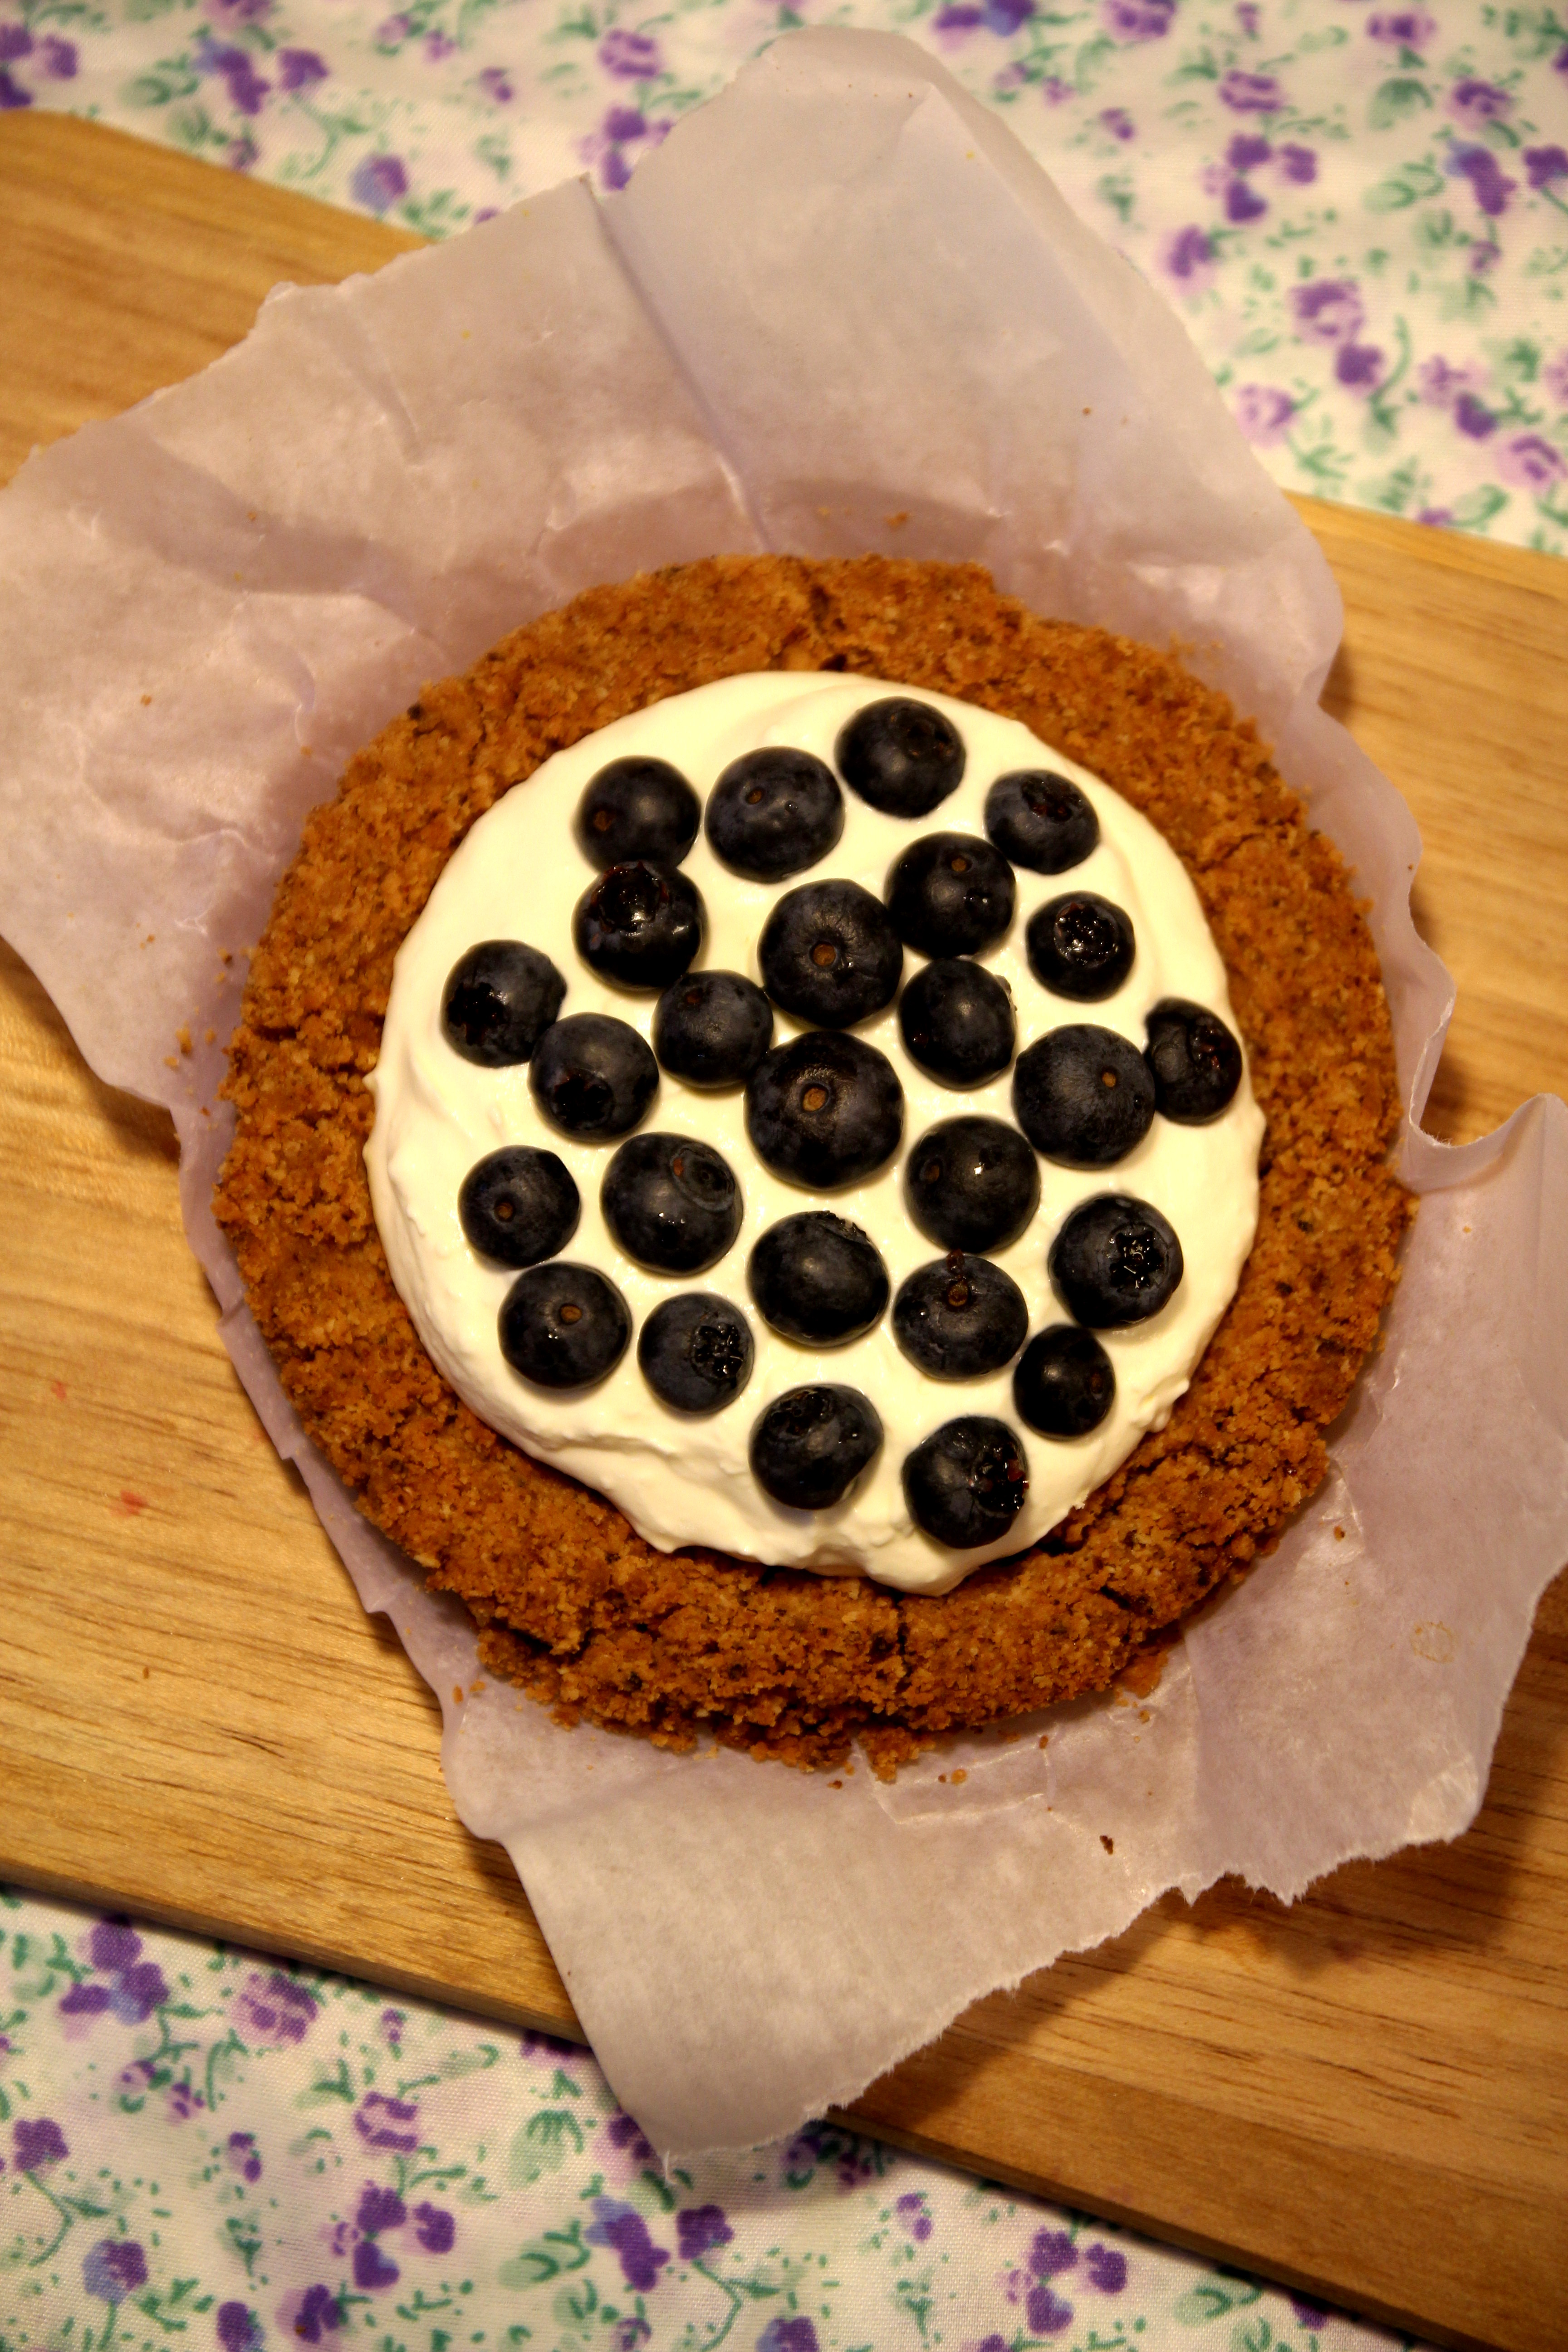 Blueberry & Cream Tart